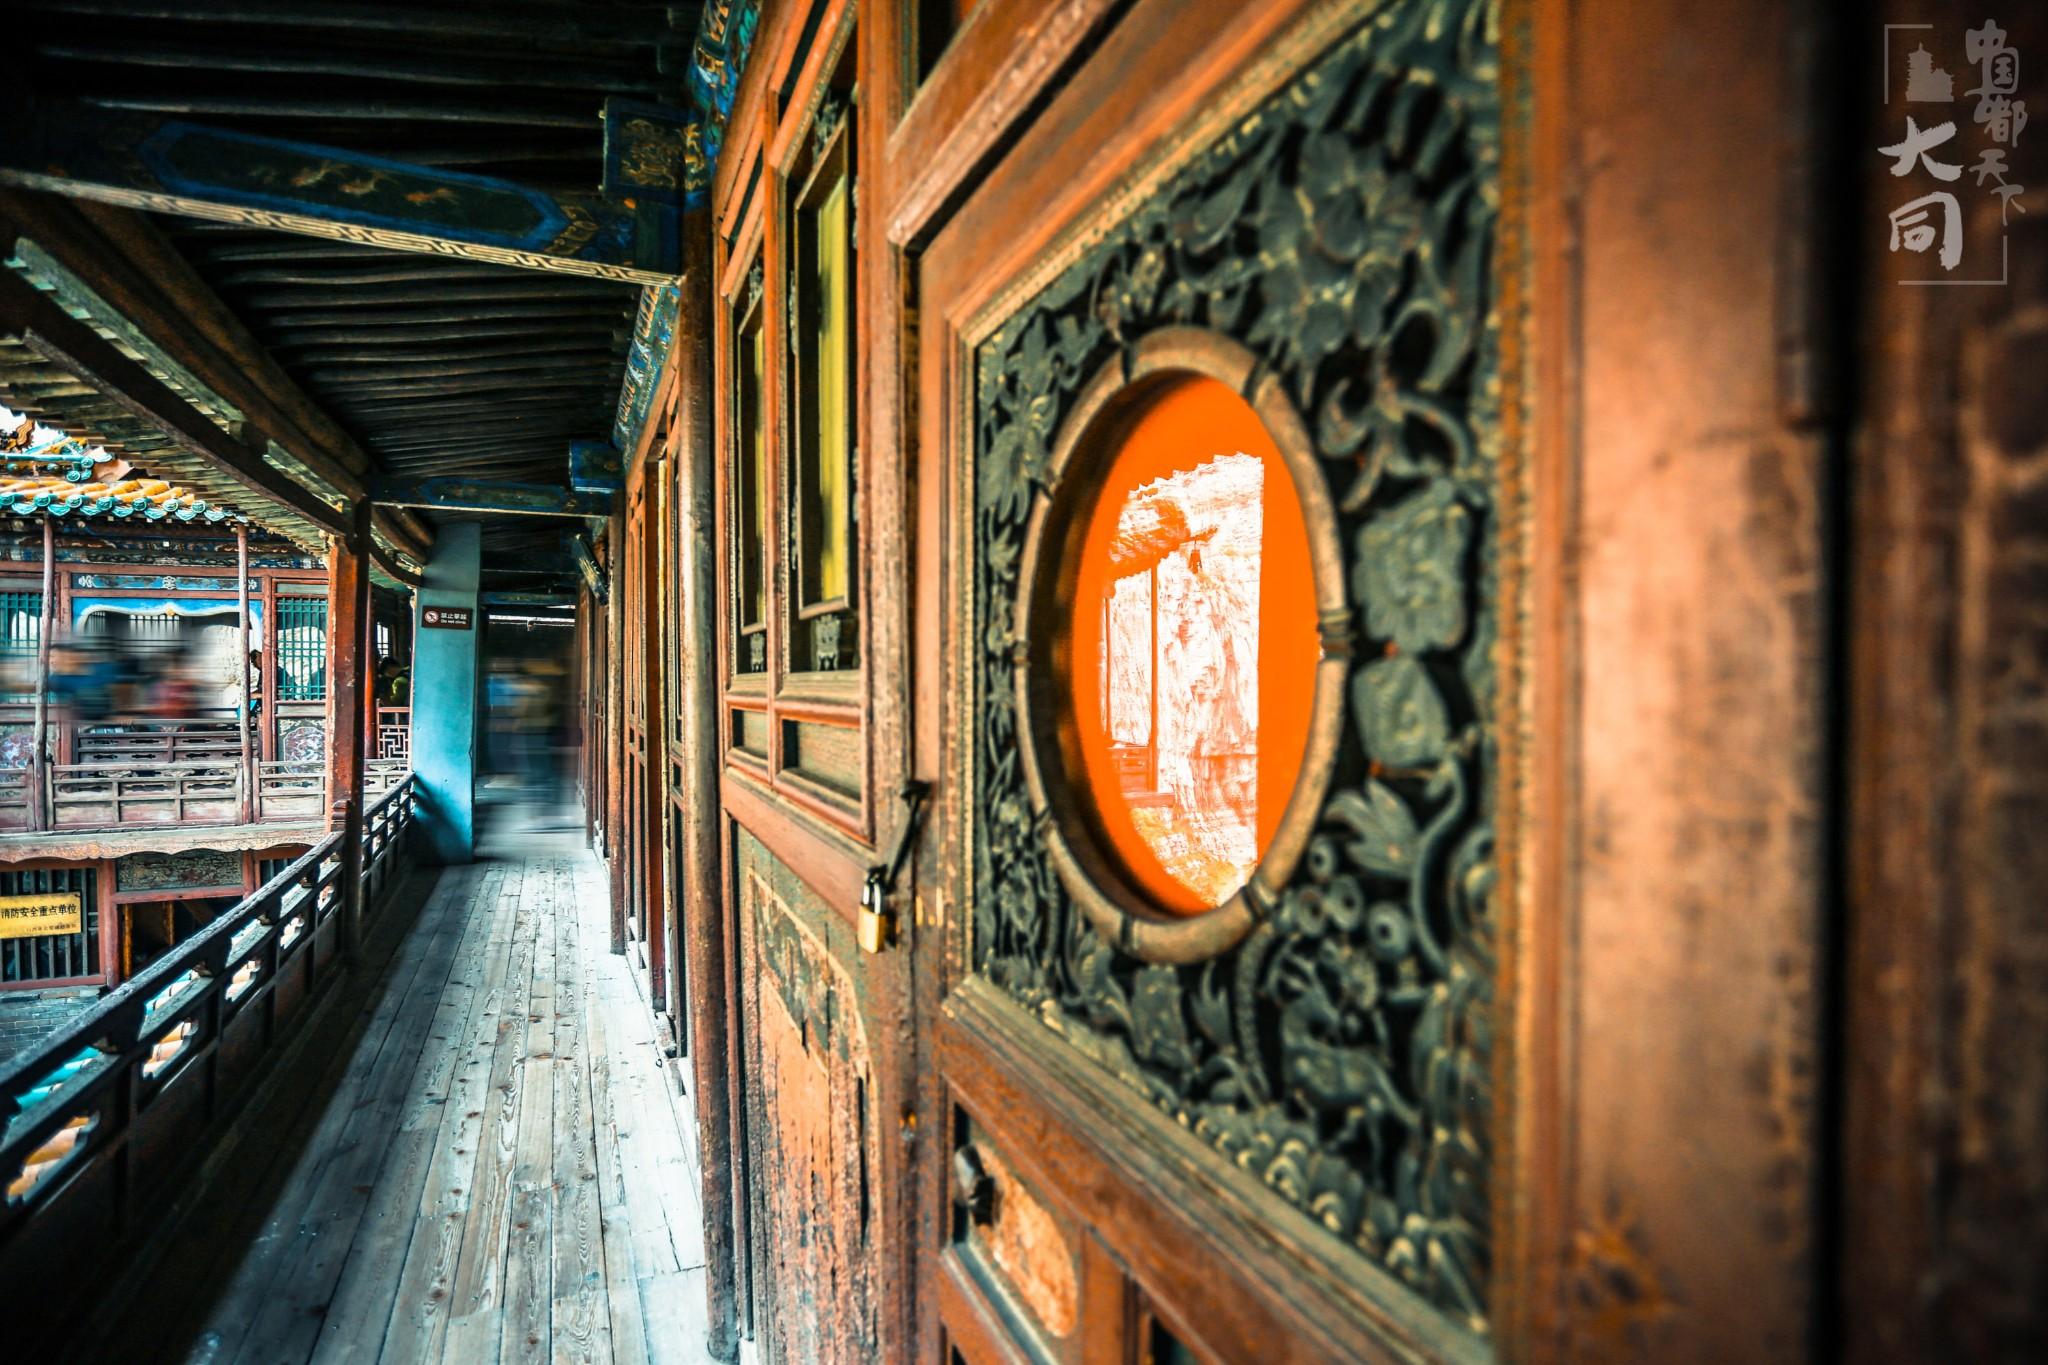 ShanXi DaTong Hanging Temple